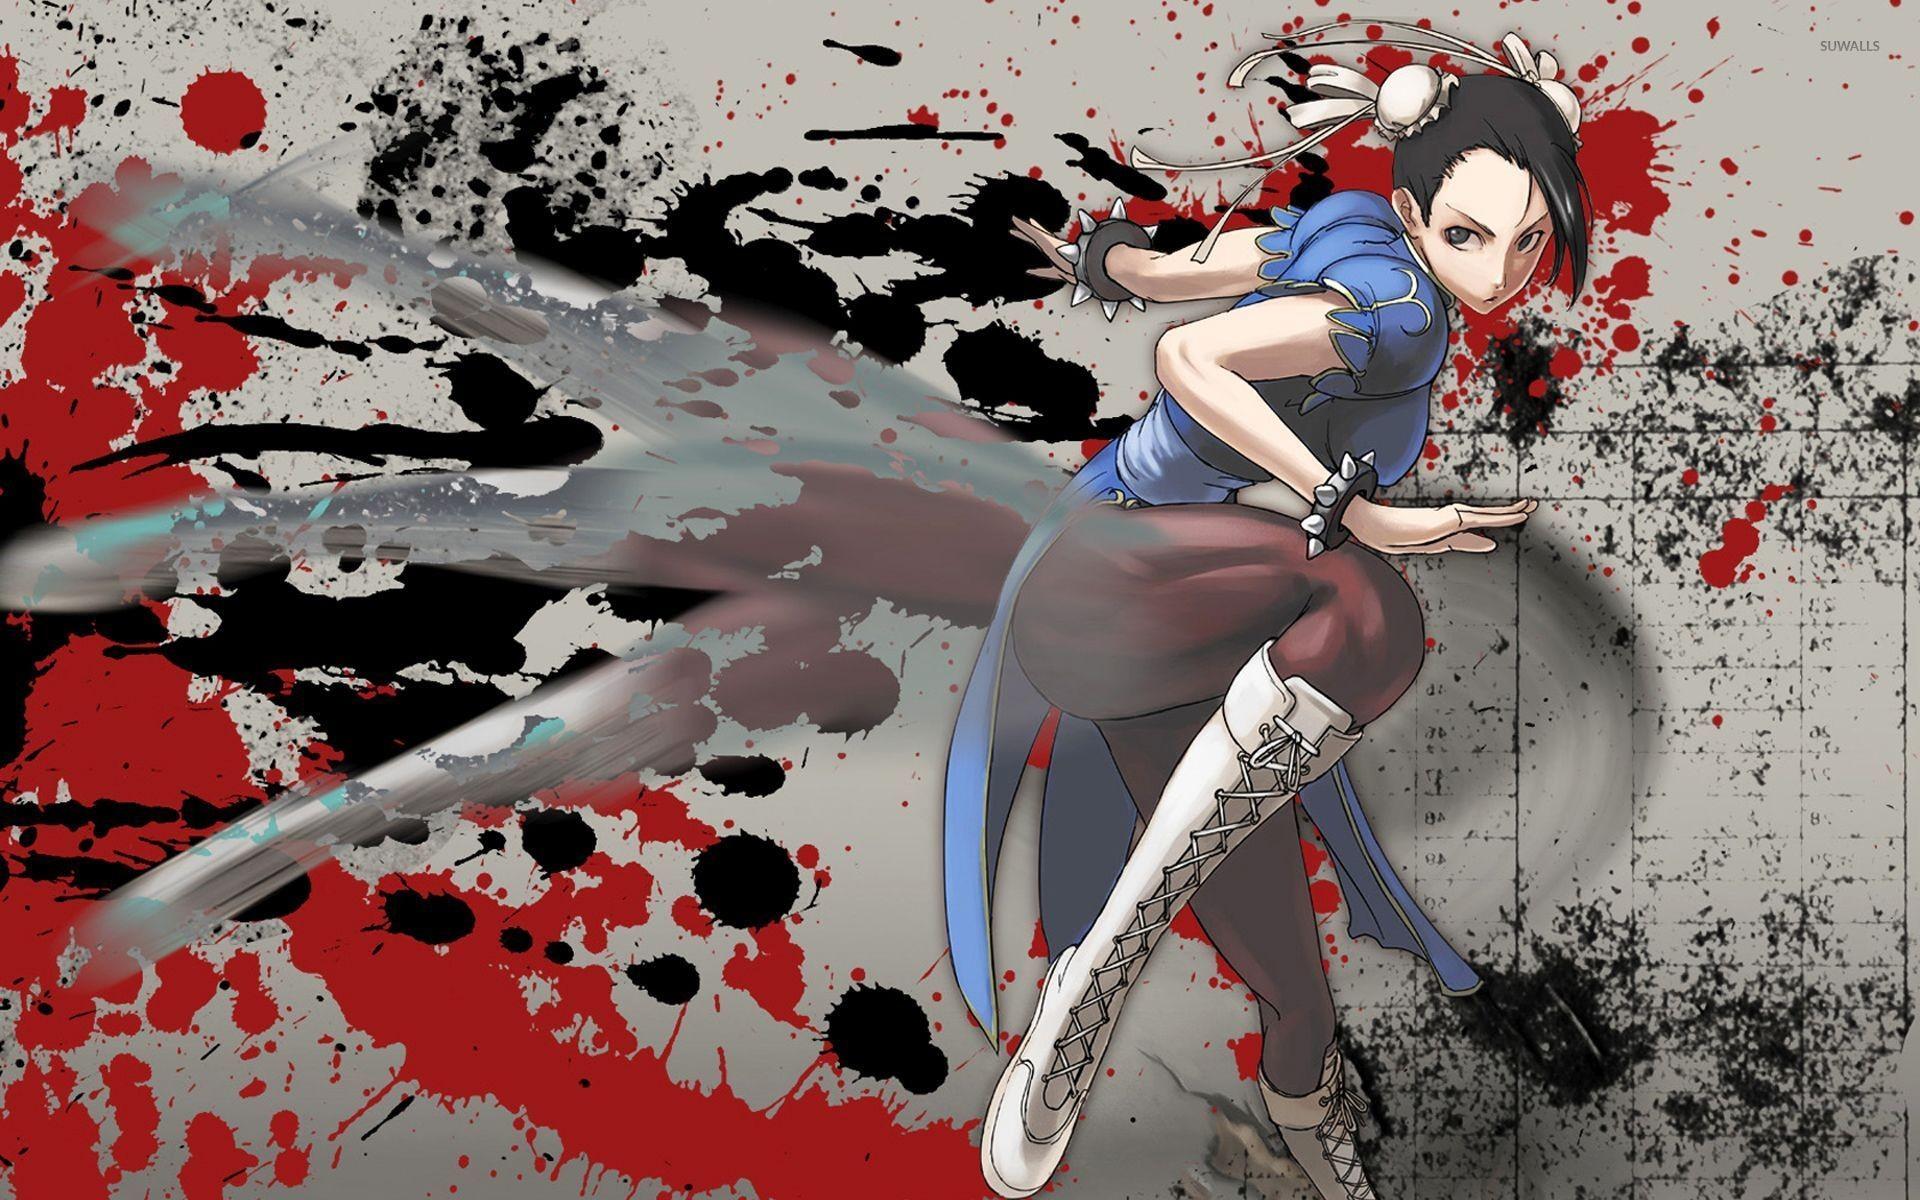 Chun-Li – The Street Fighter wallpaper jpg